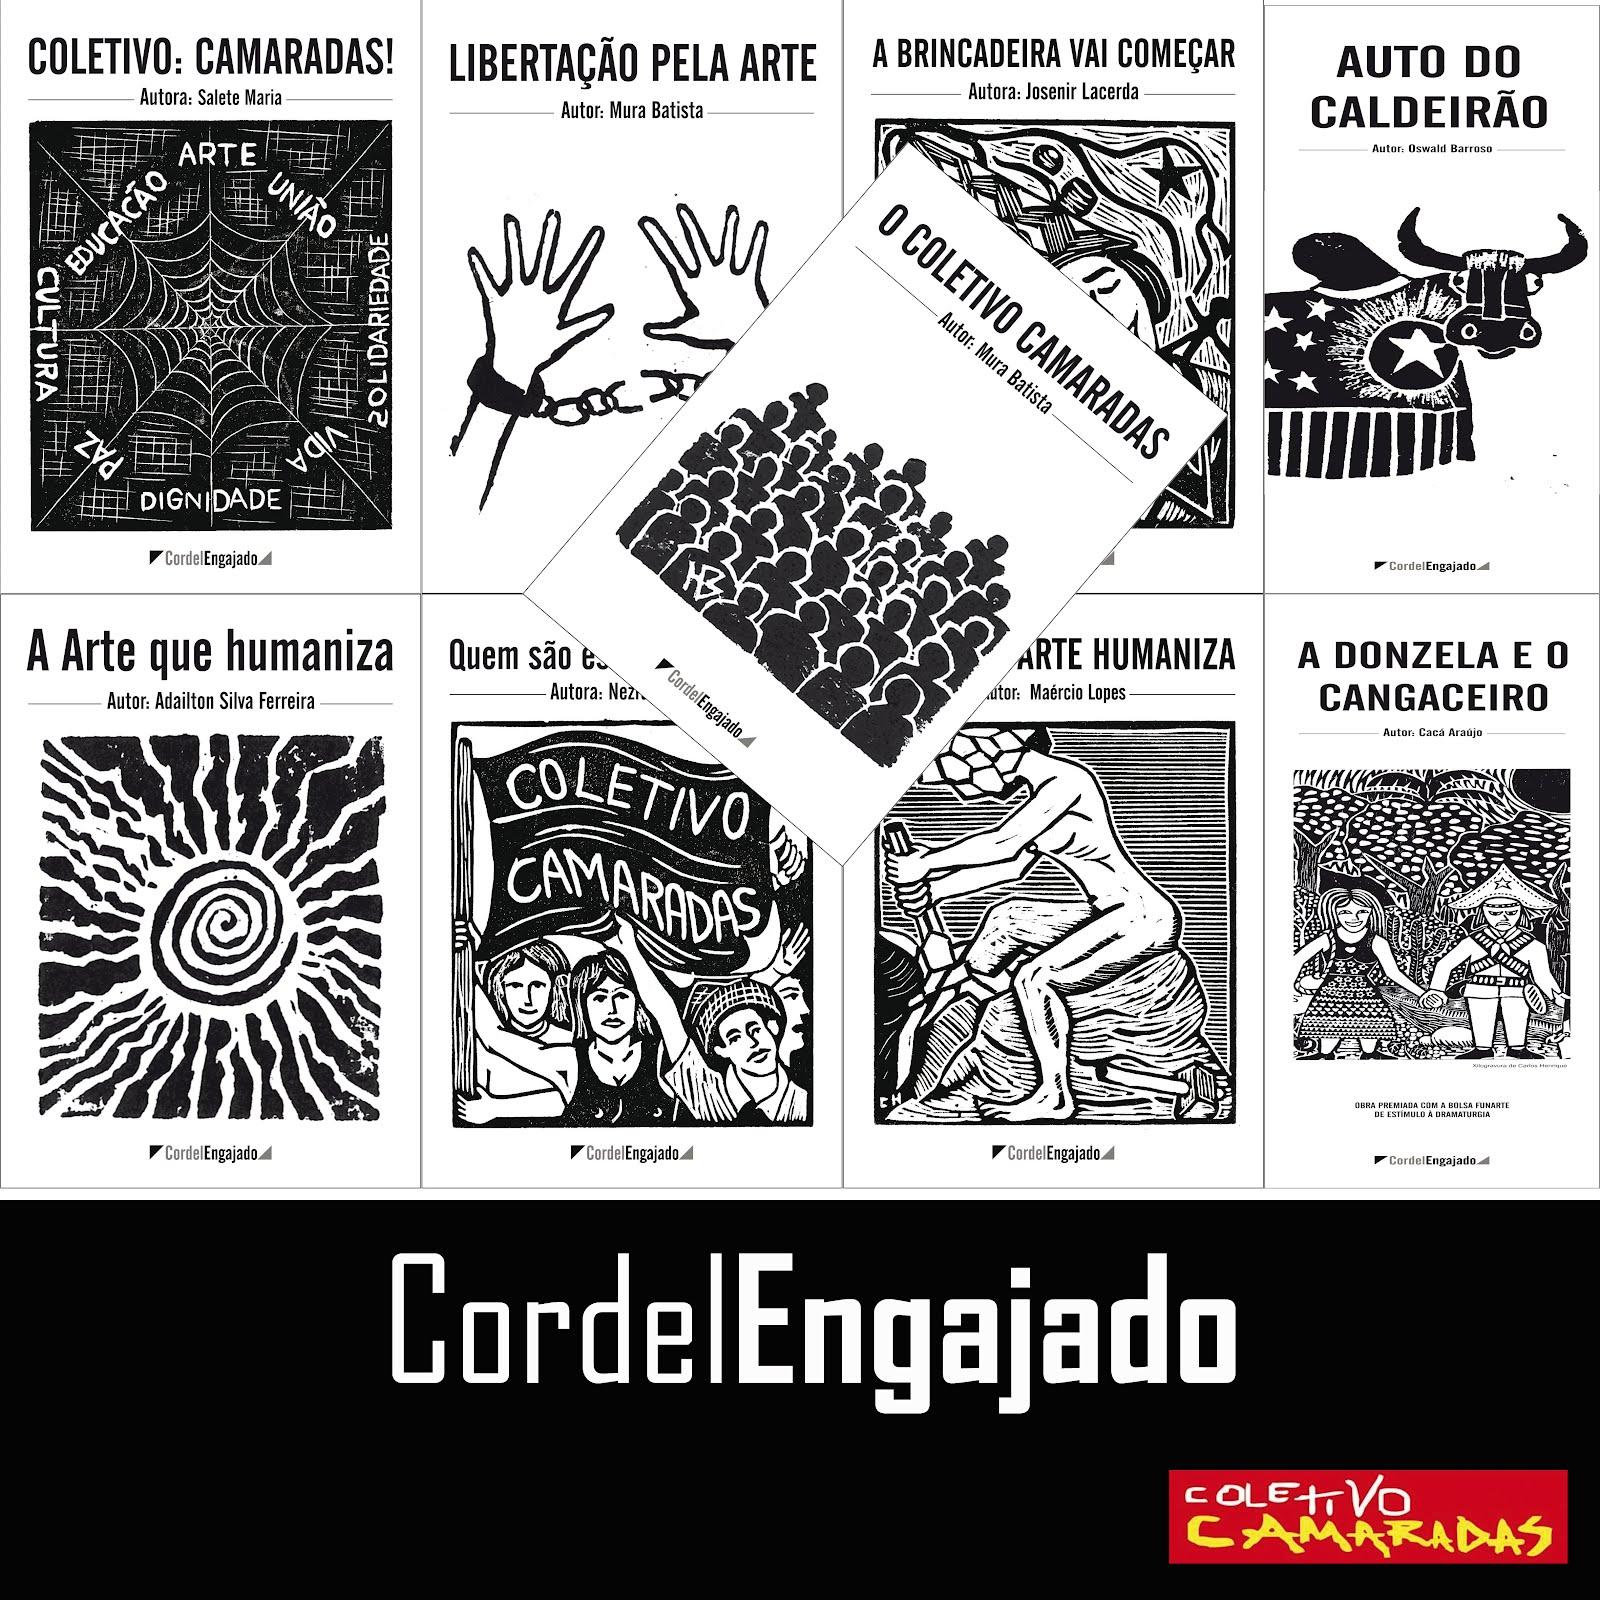 Cordel Engajado